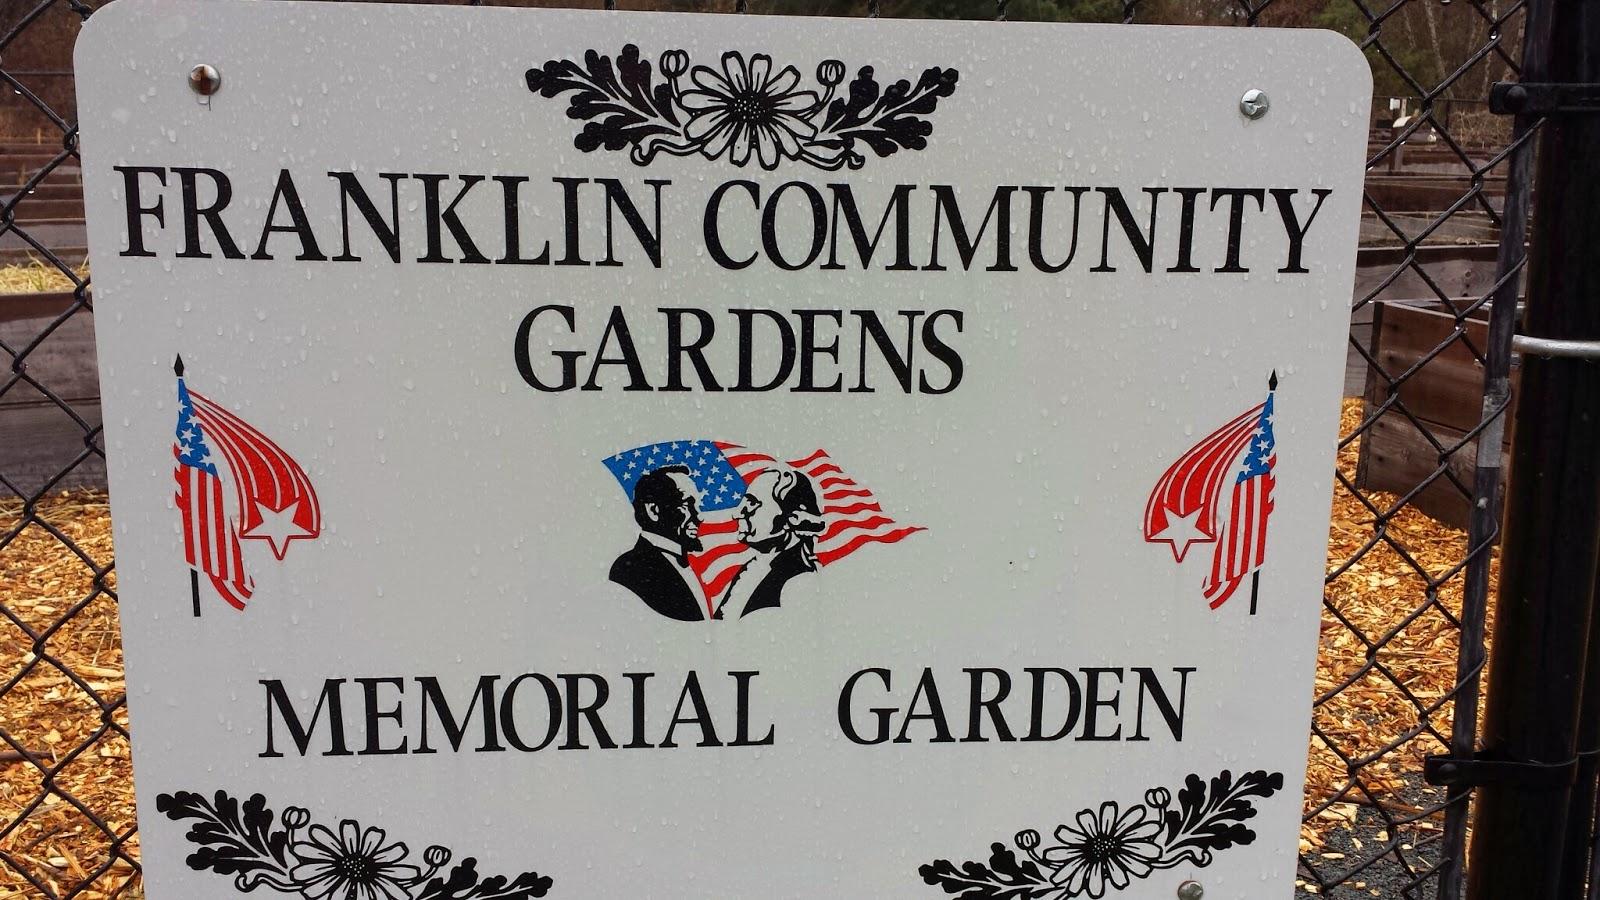 Franklin Community Gardens